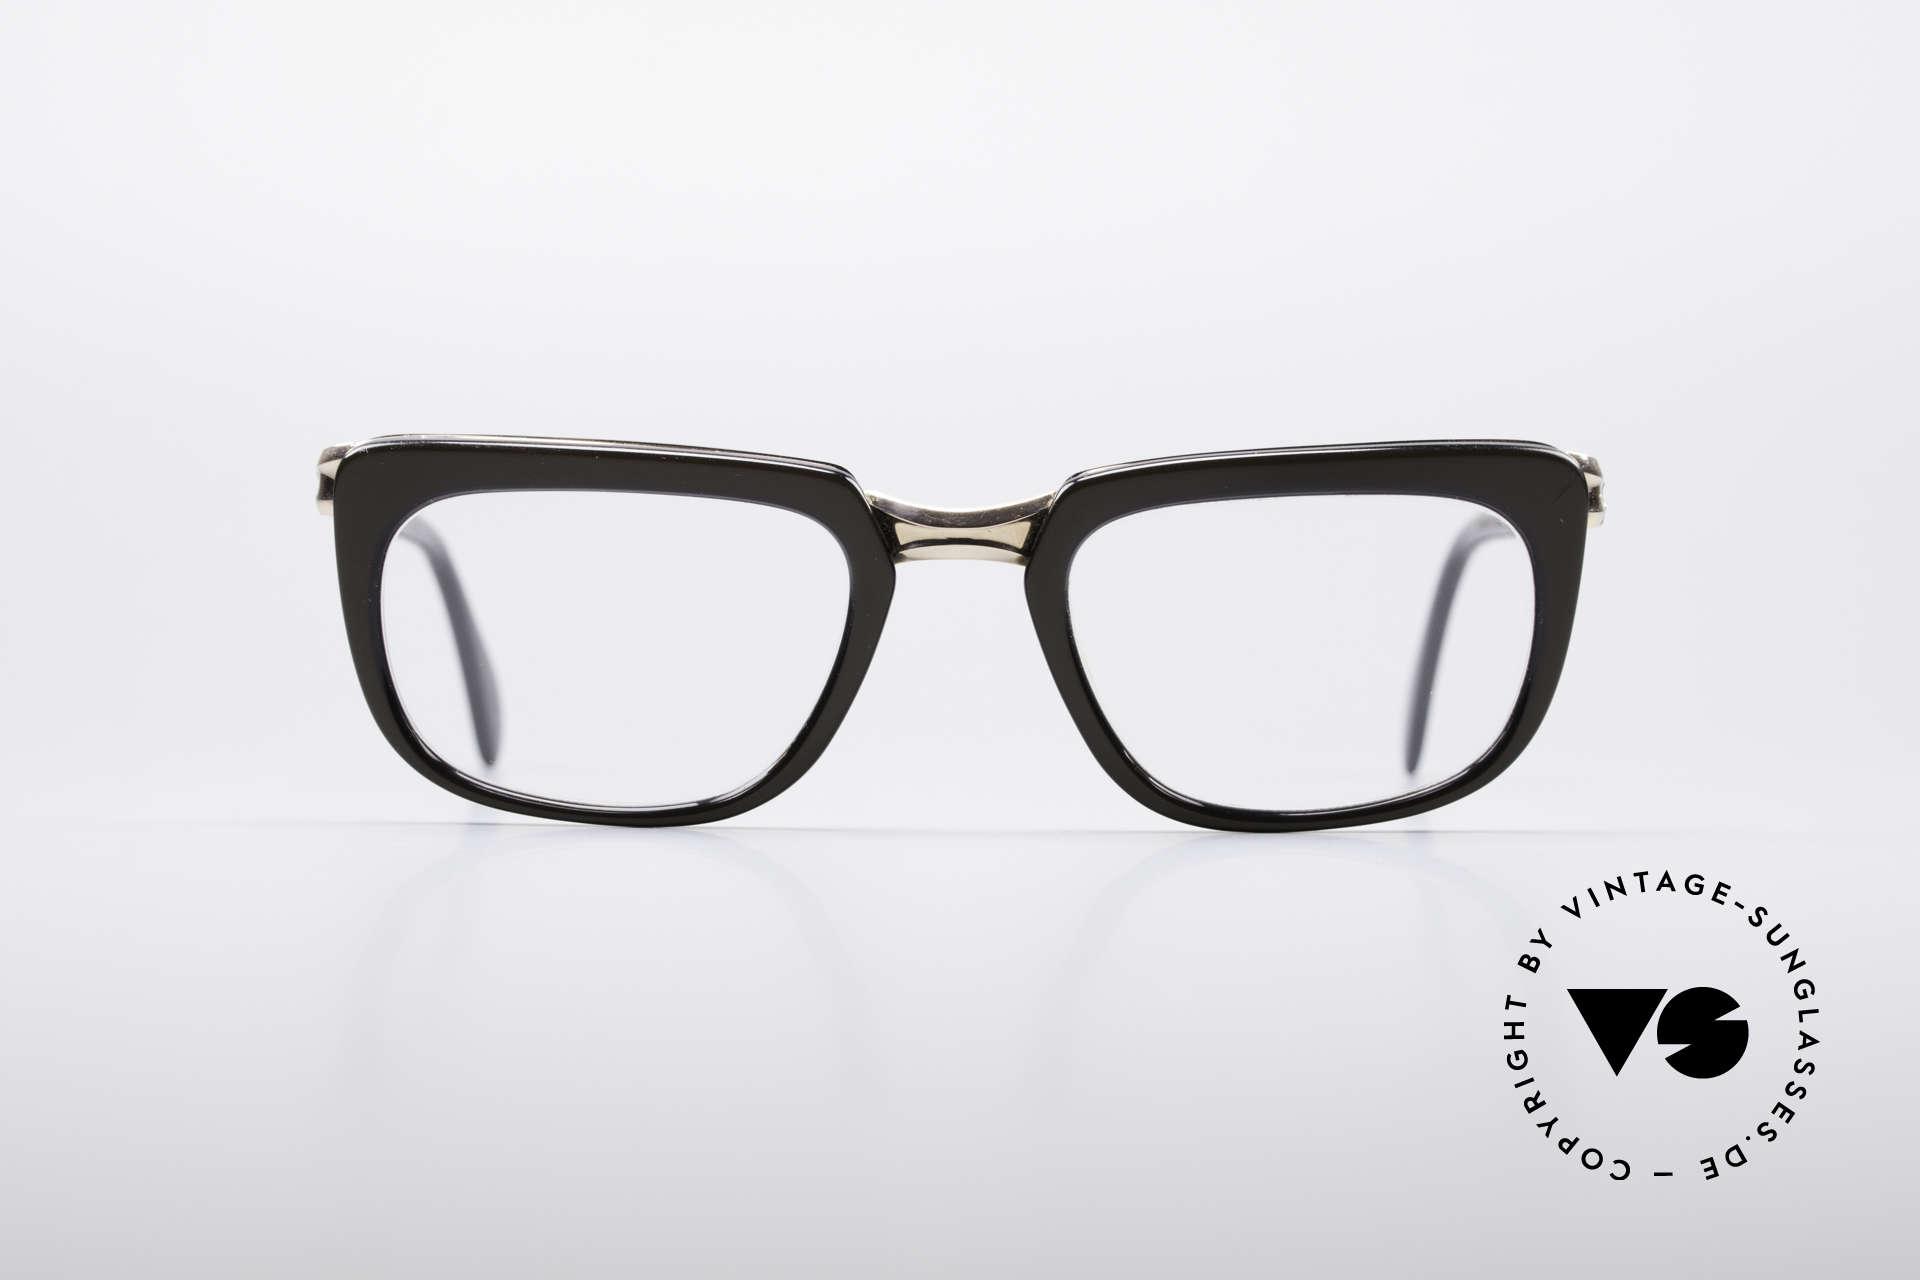 ec6dfaafb6 Glasses Metzler GL Gold Filled 60 s Glasses